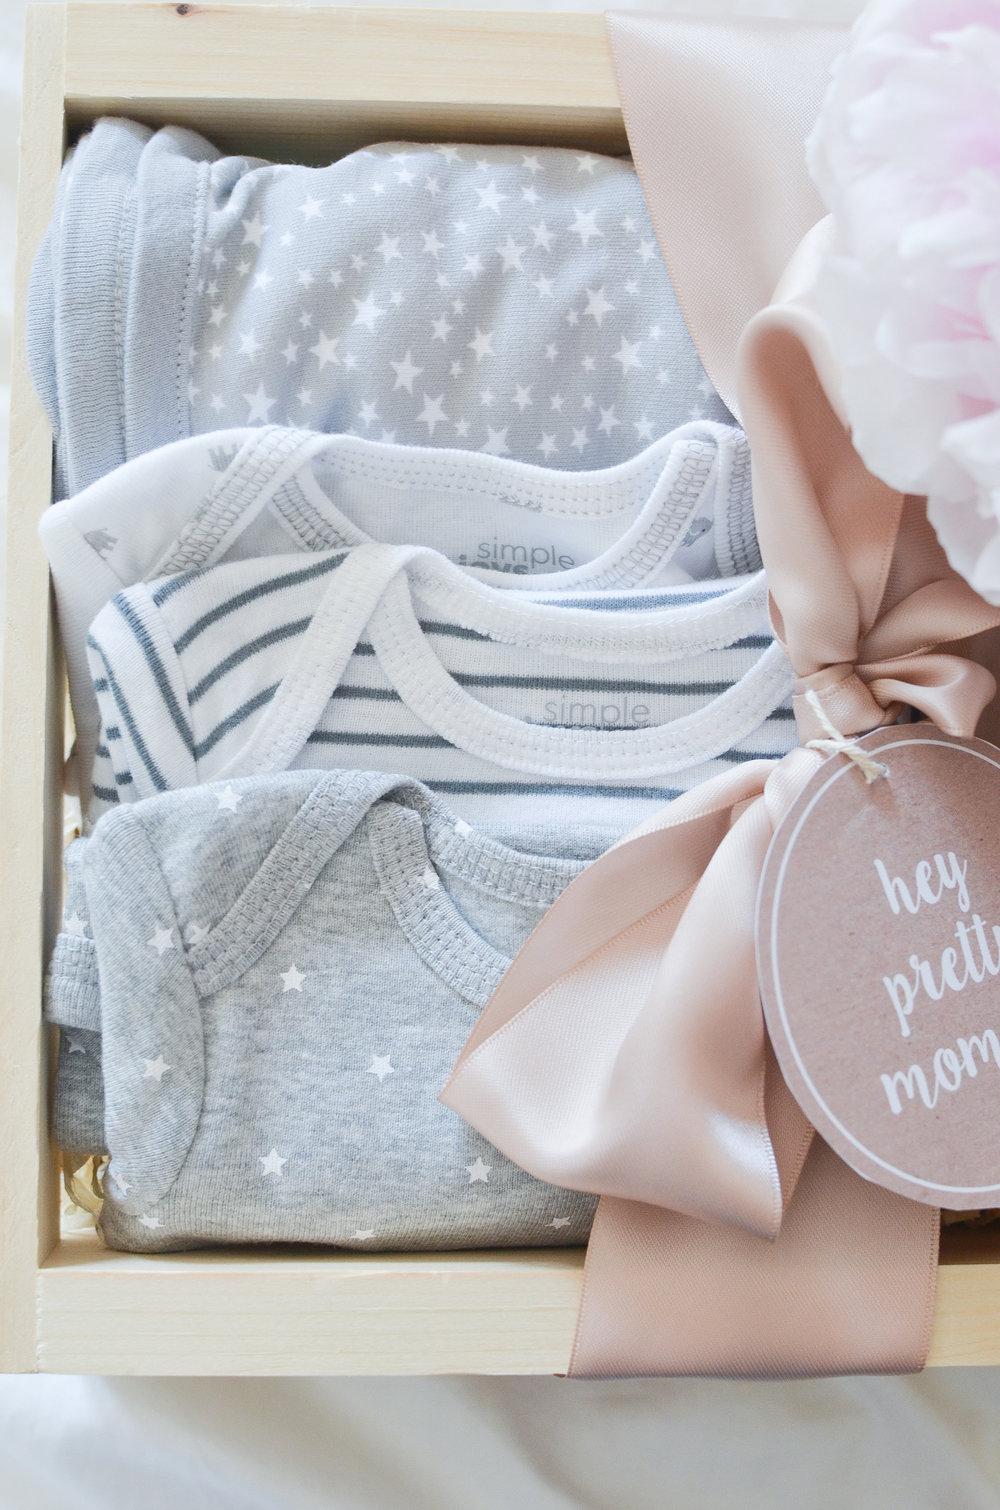 Baby Shower Gift | Baby Gift | New Mom Gift | Newborn Gift | Hospital Gift